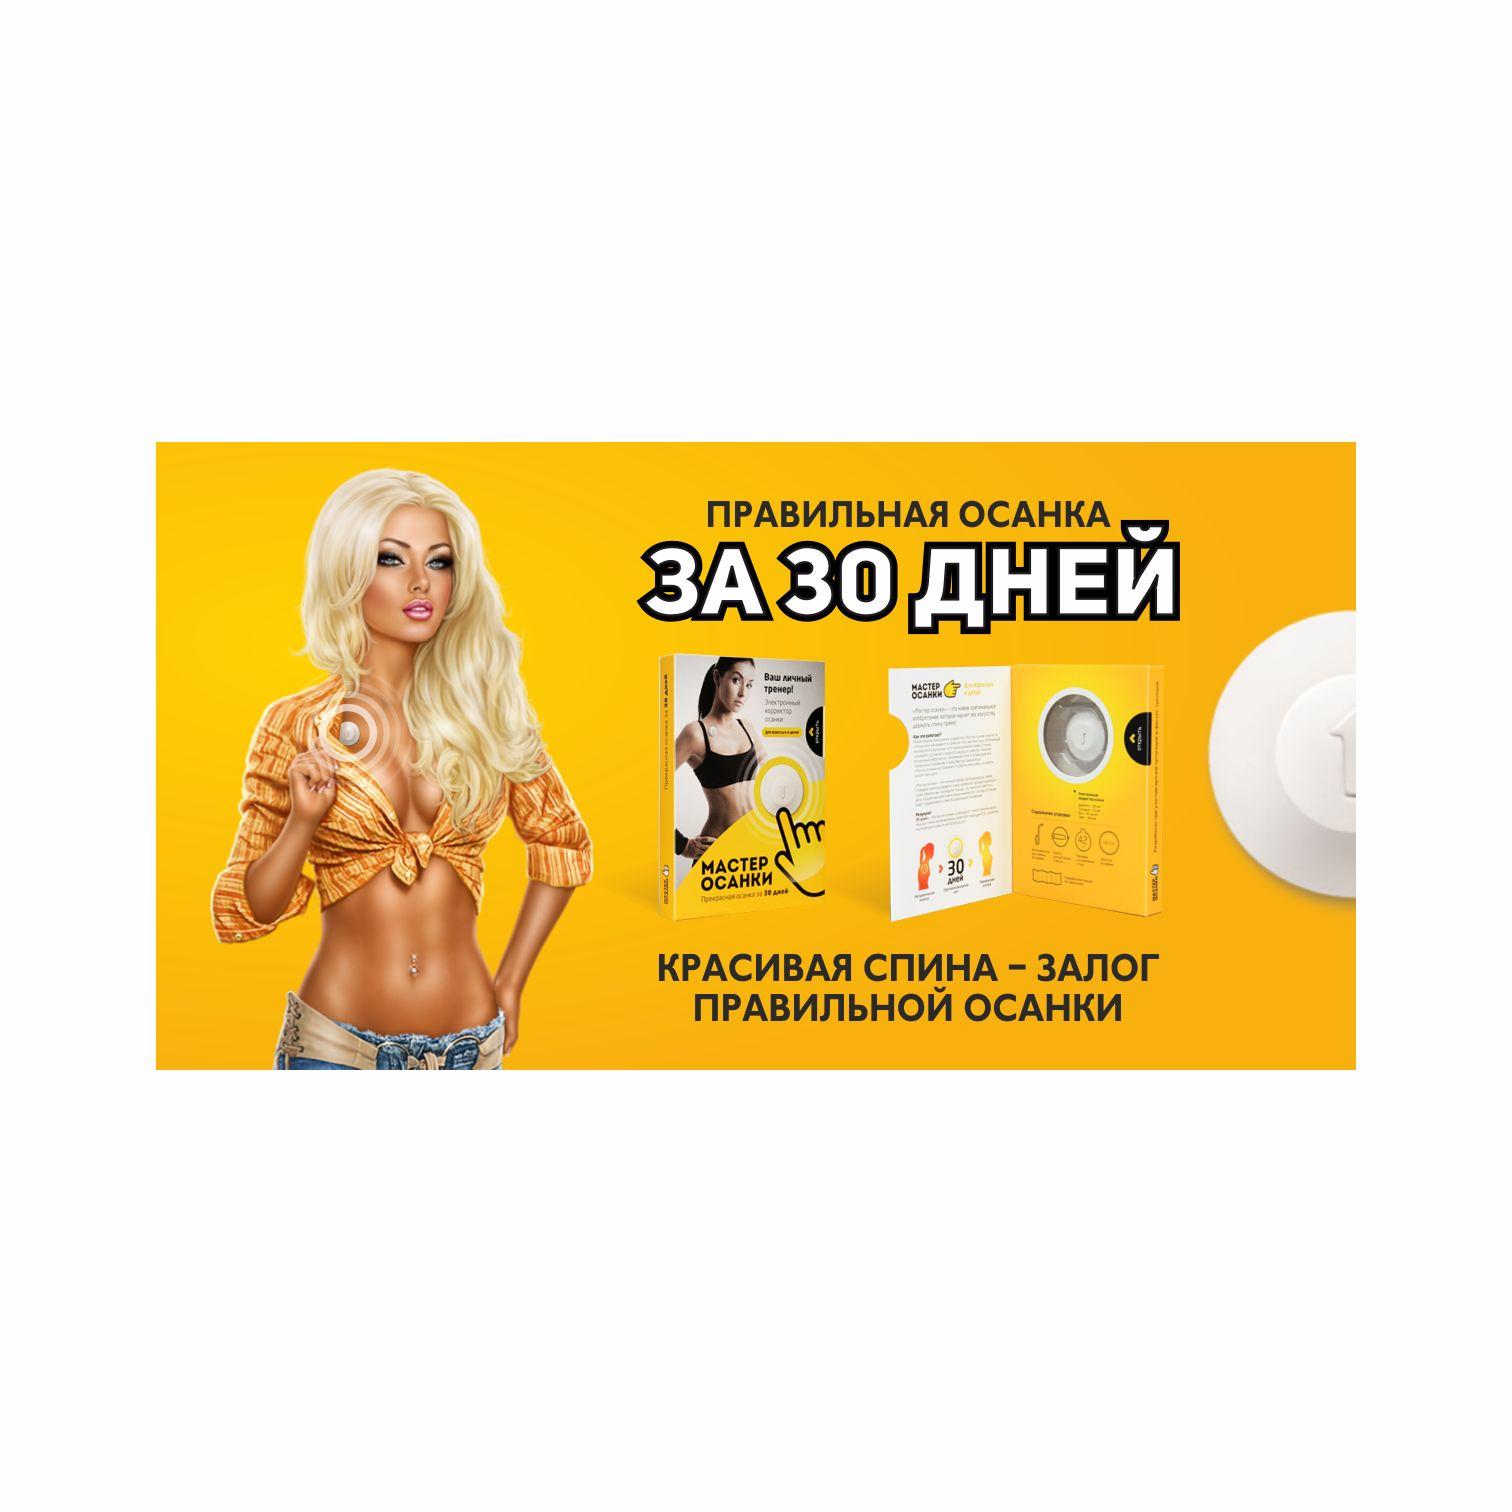 Баннер для Instagram, для гаджета Мастер осанки - дизайнер Katarinka